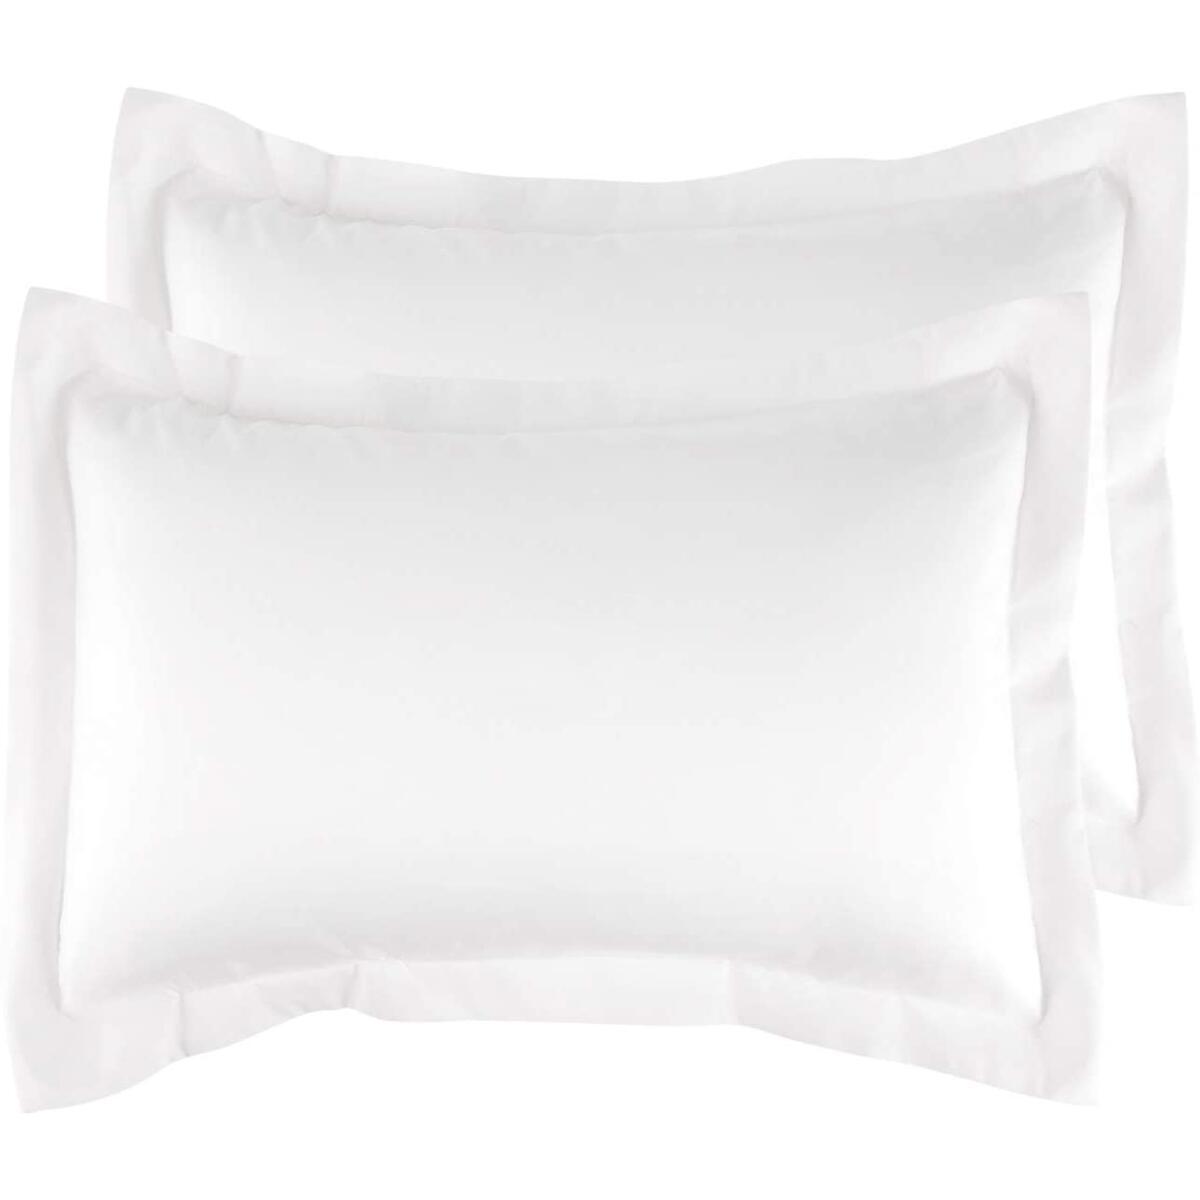 Brushed Pillow Shams White 20*26